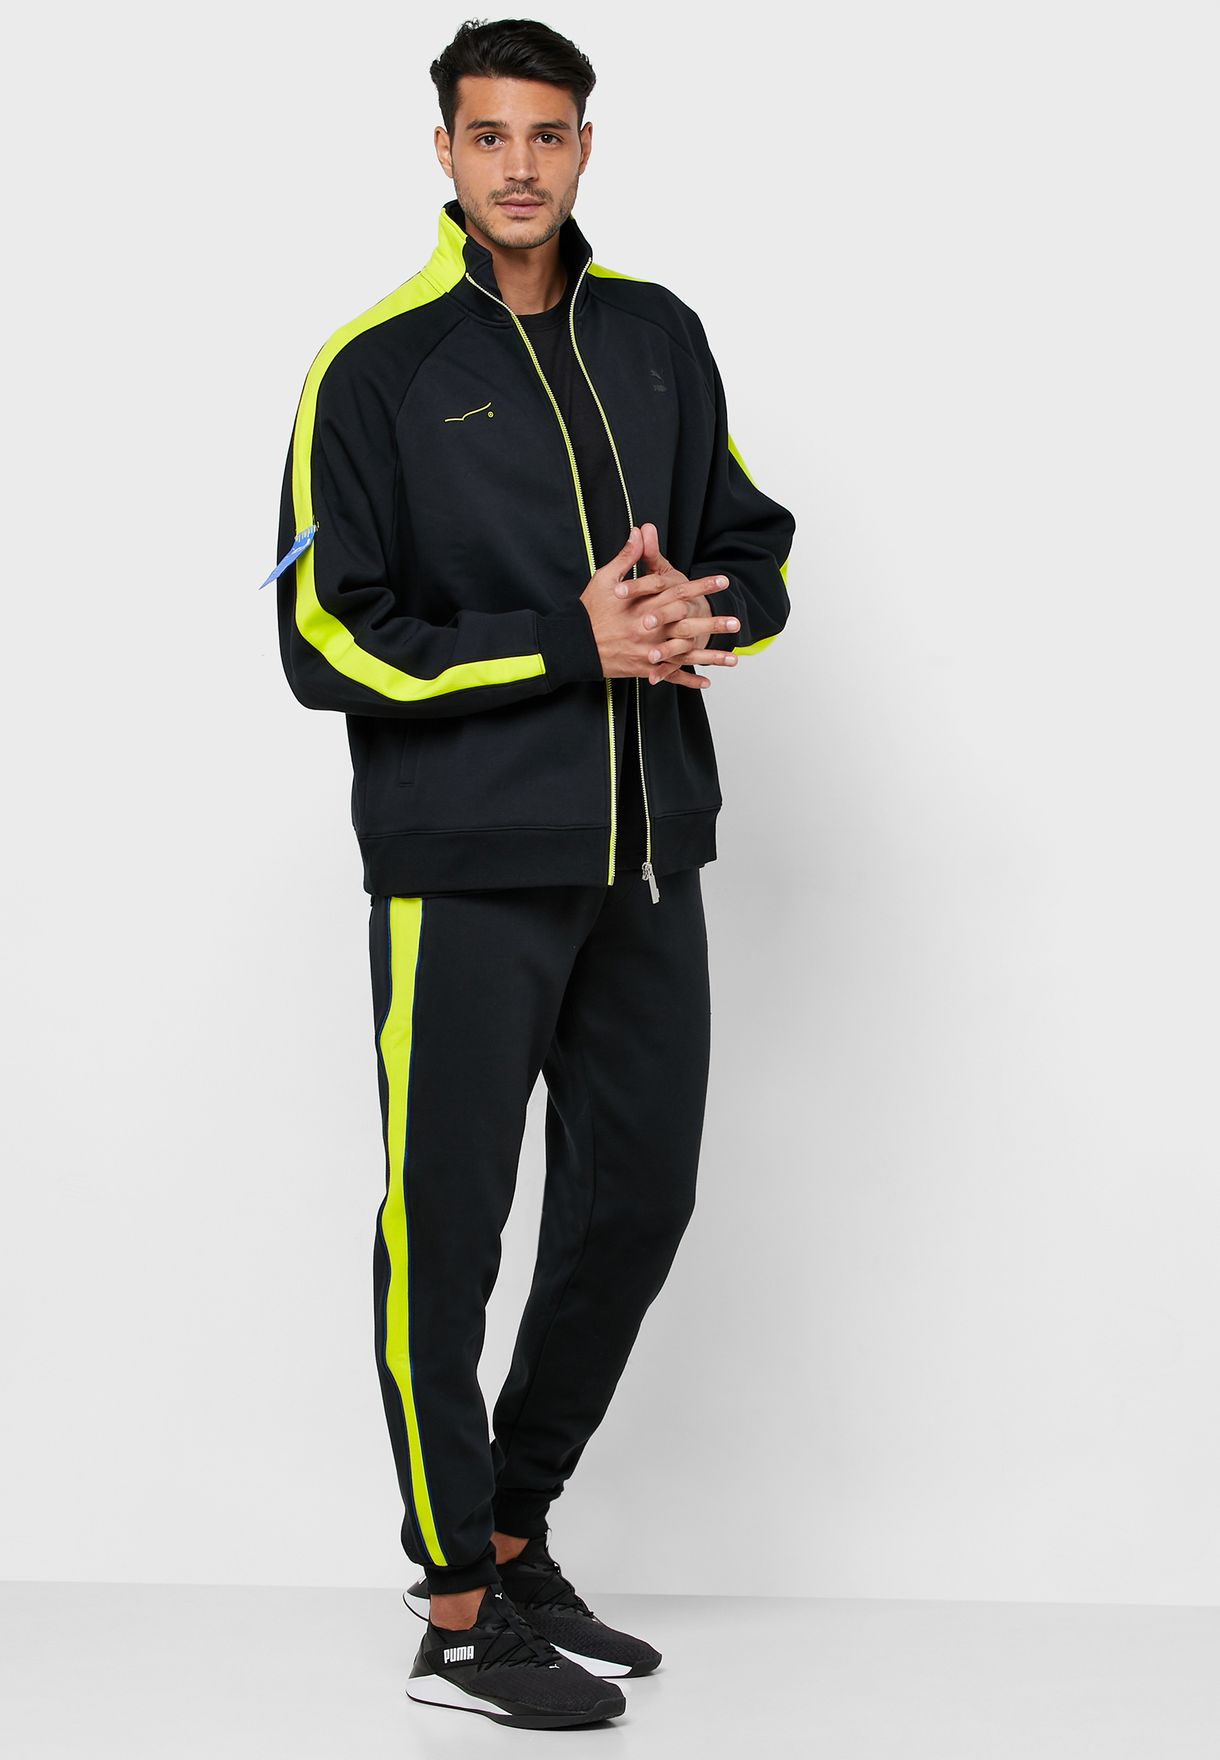 Ader T7 Sweatpants